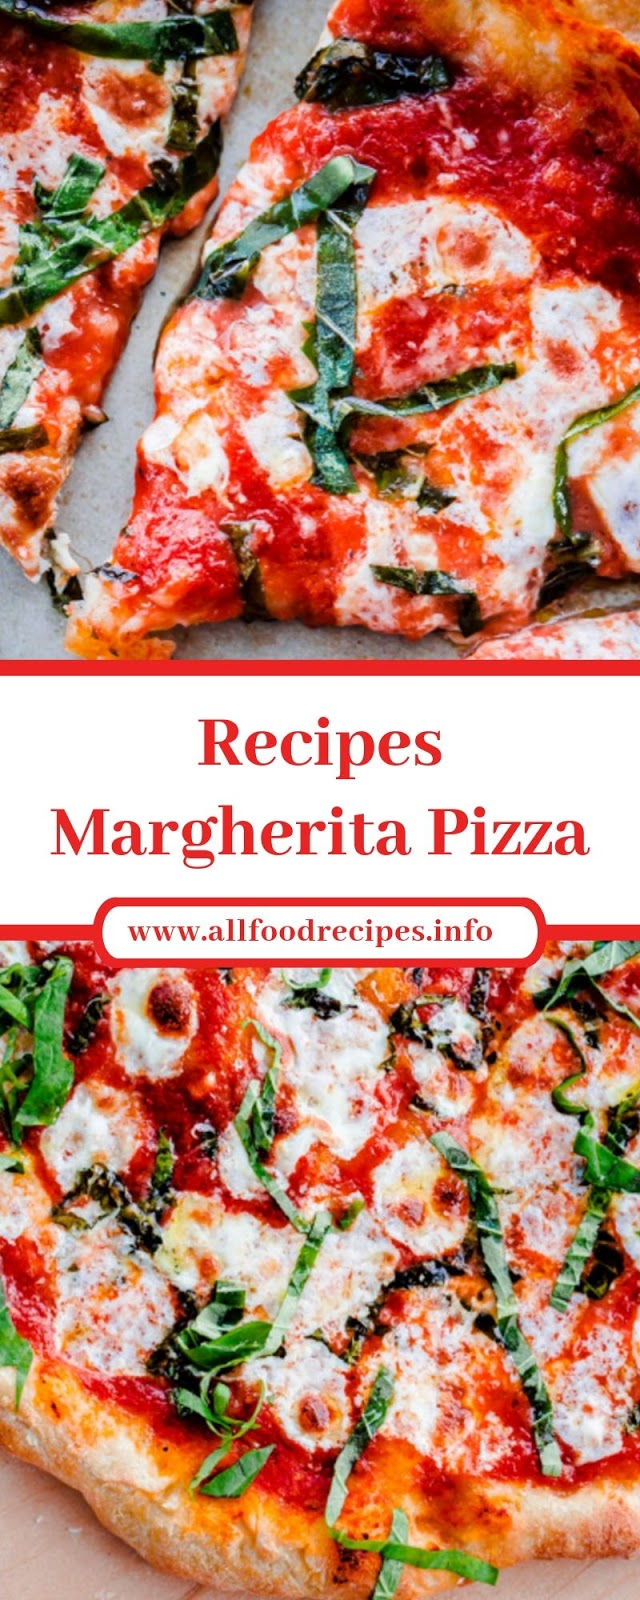 Recipes Margherita Pizza